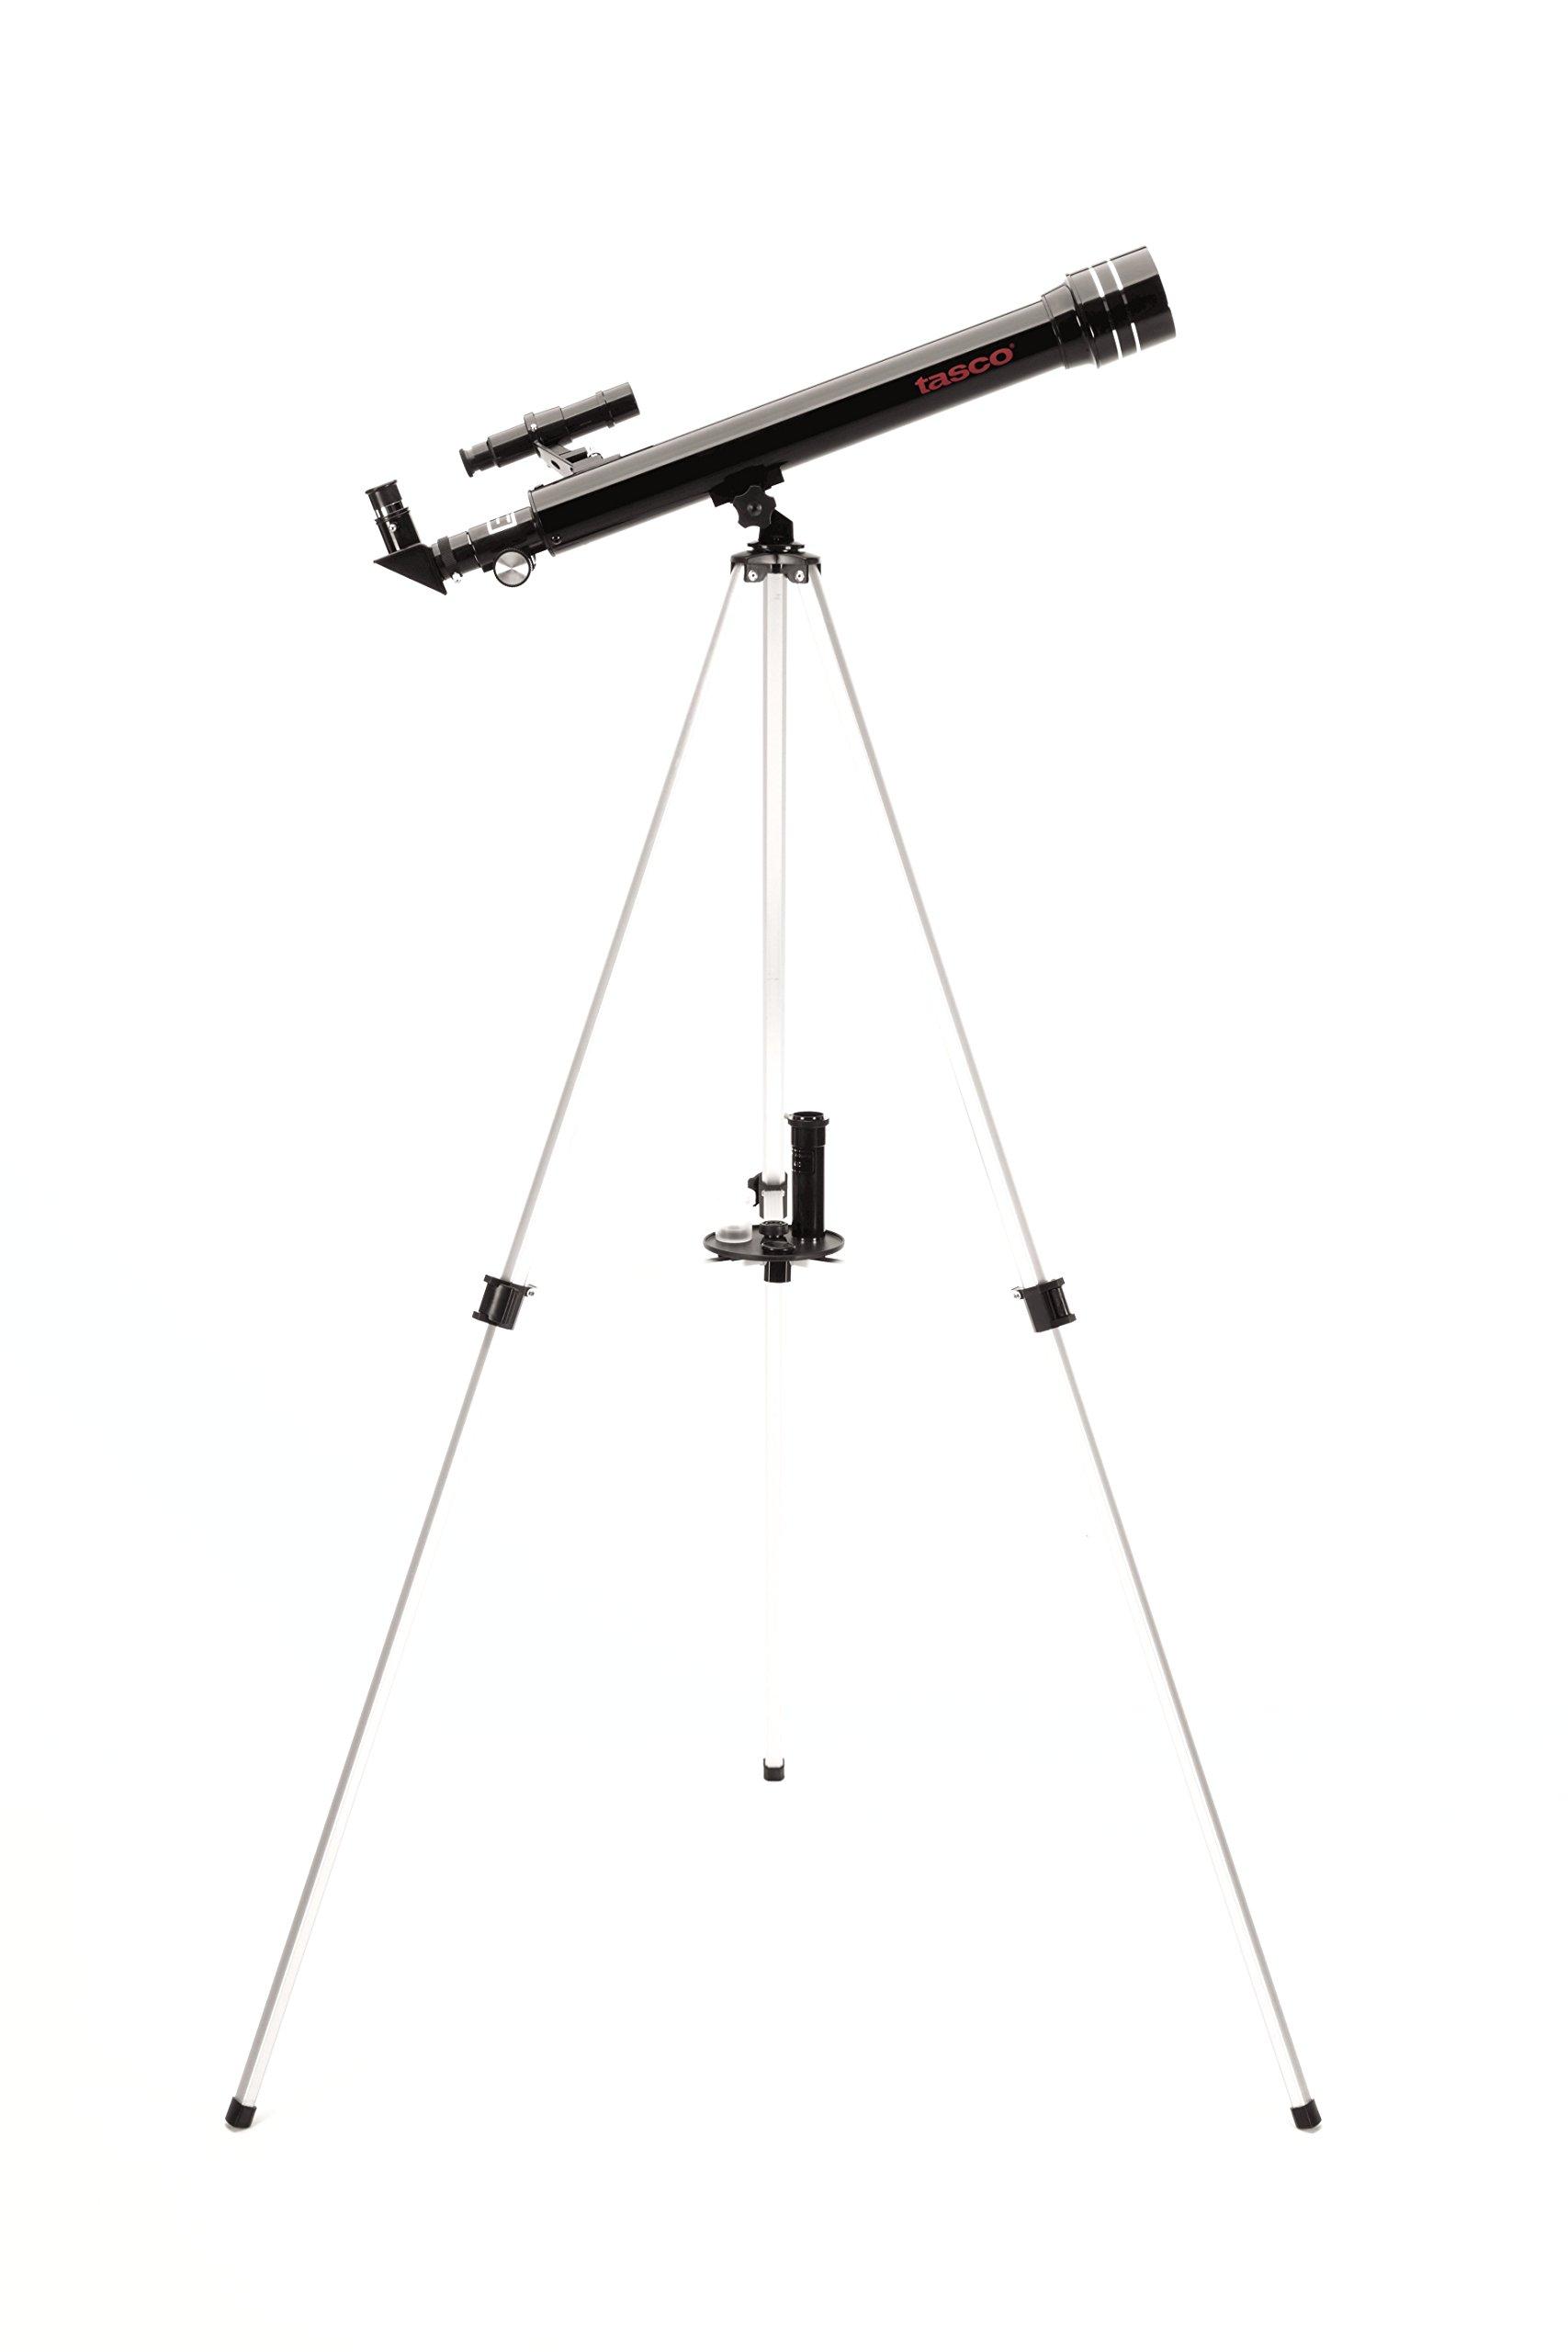 TASCO Novice Refractor Telescope (600-mm x 50-mm) by TASCO